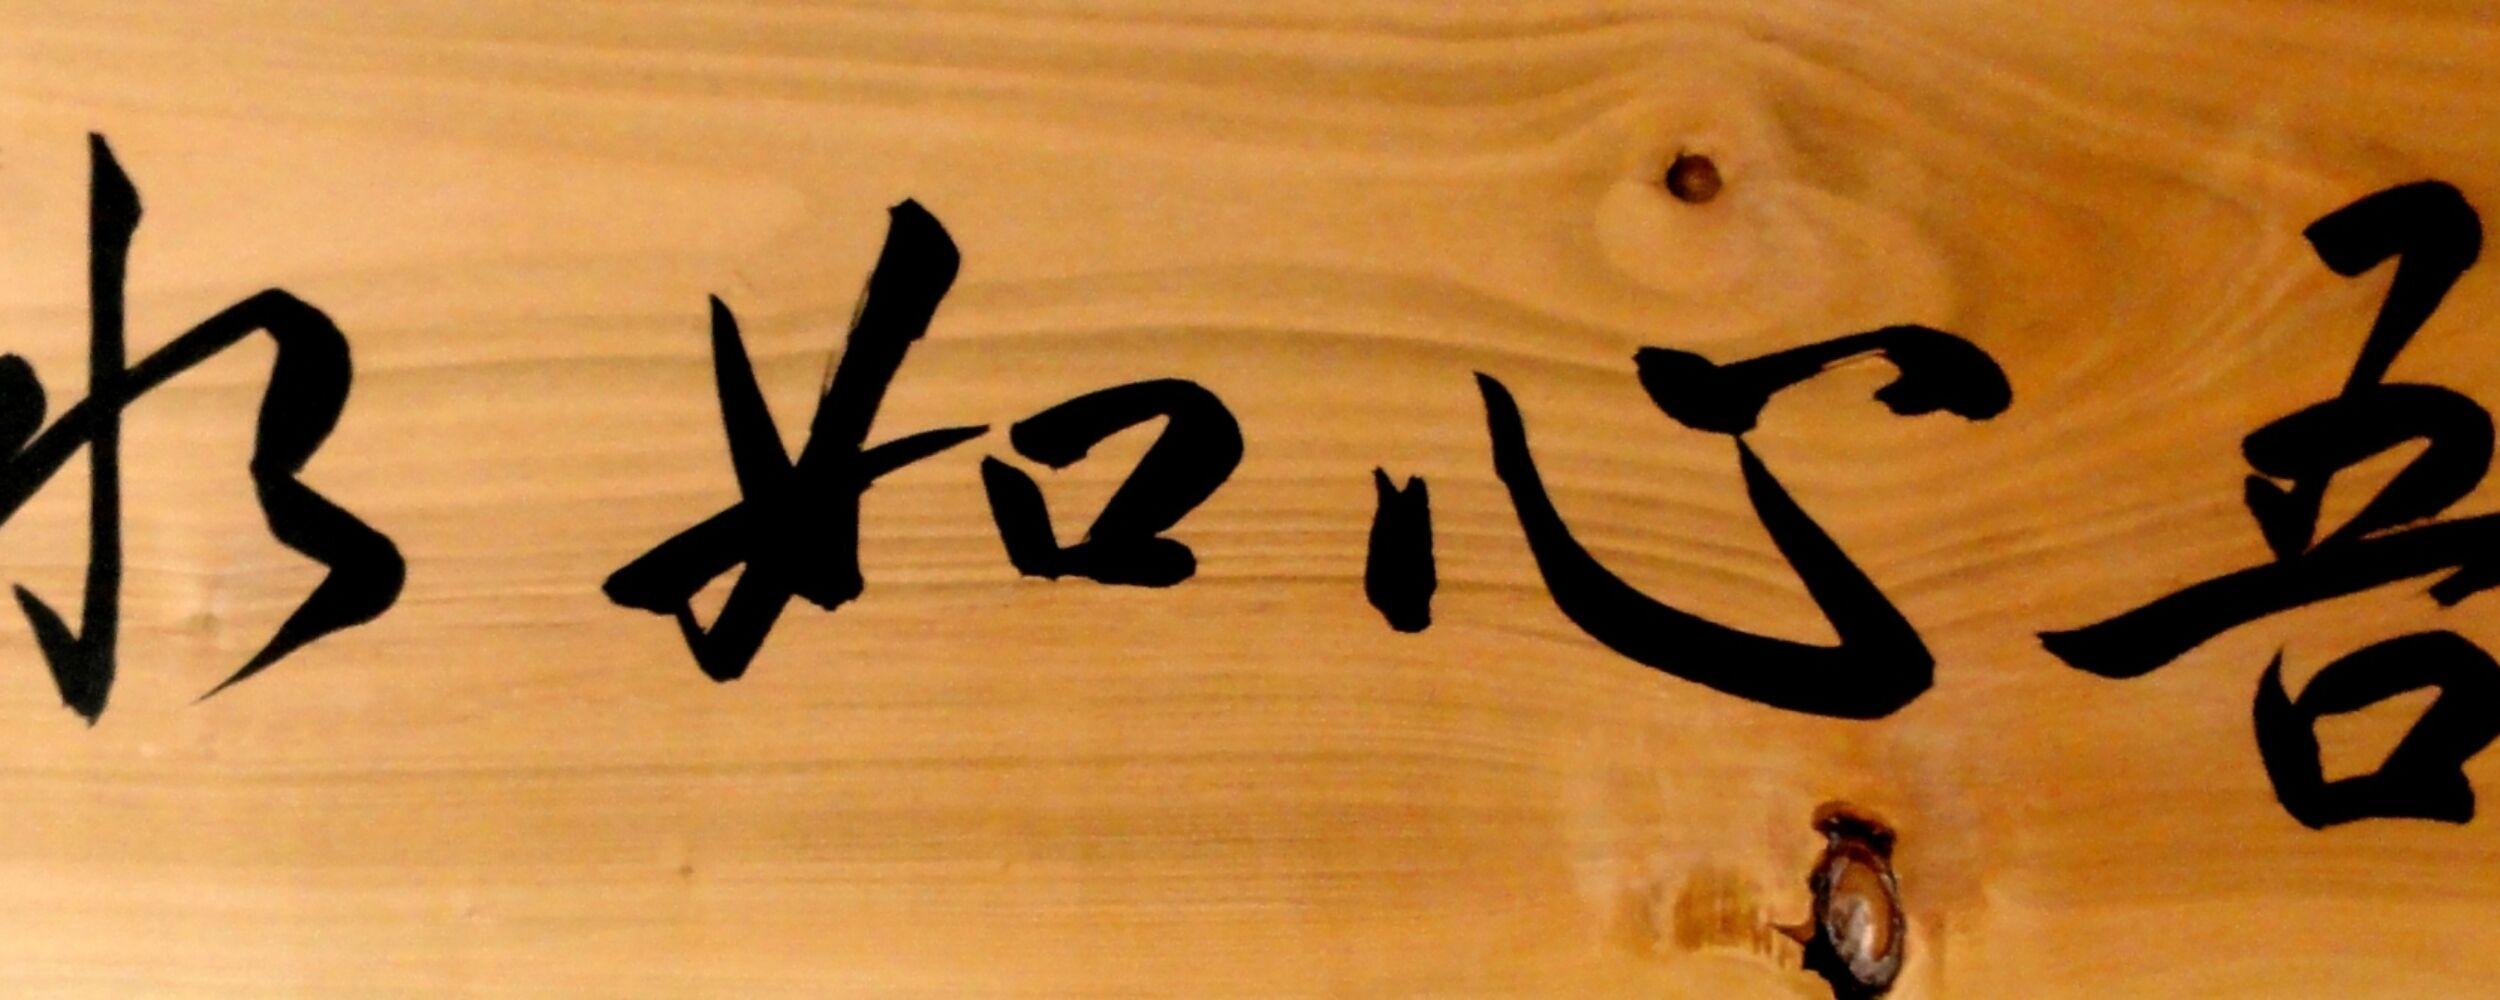 Workshop Kalligrafie Kaishinkan 4 2013 Kopie 2